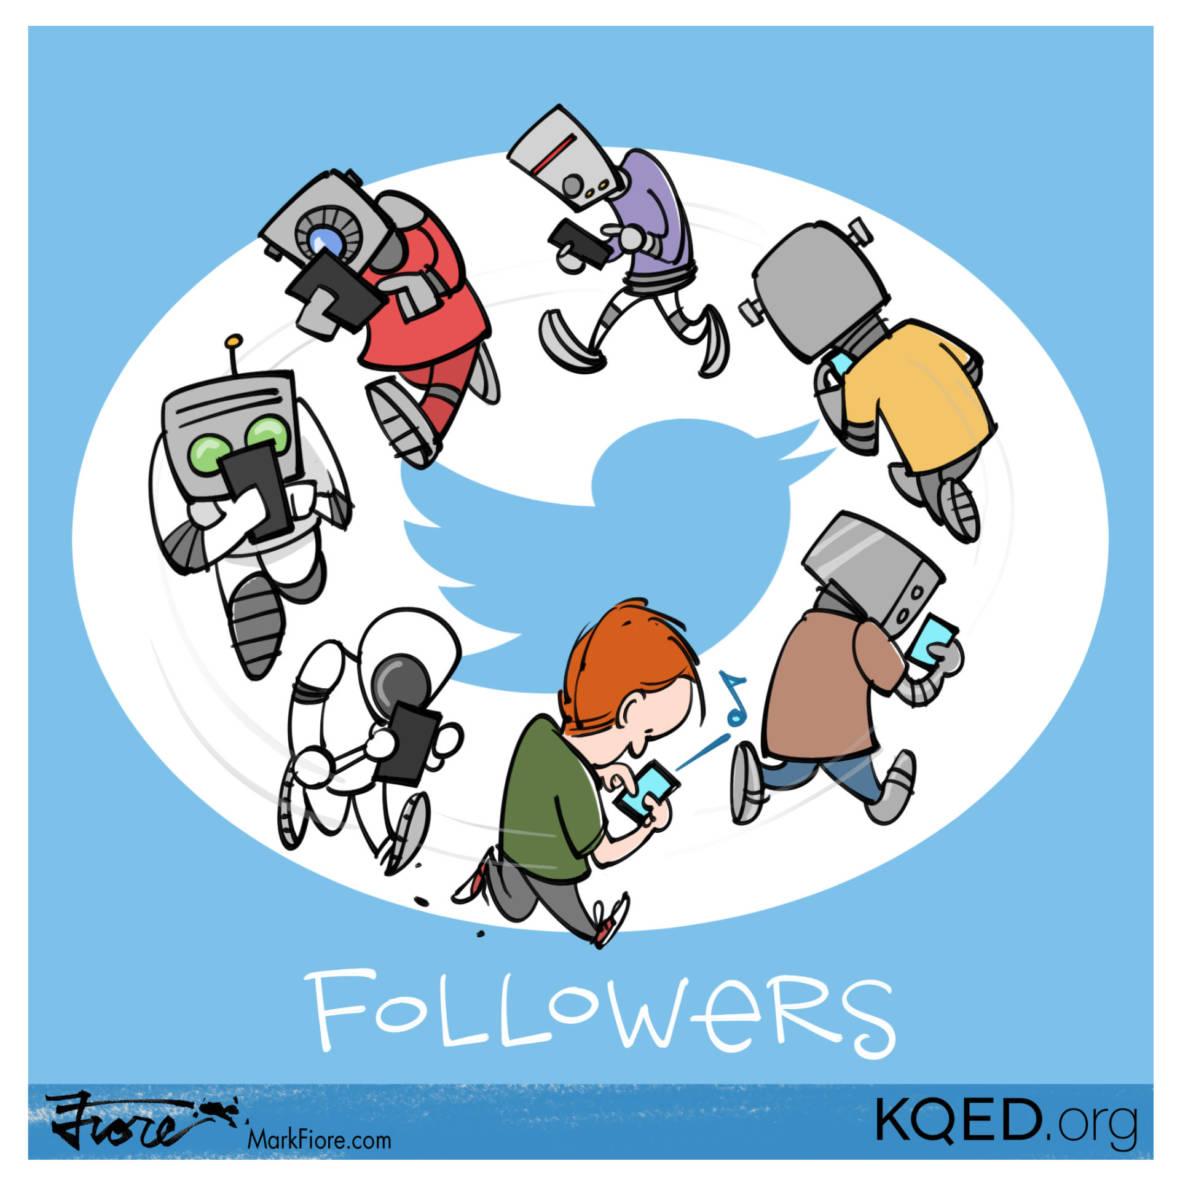 Twitter's Bot Invasion